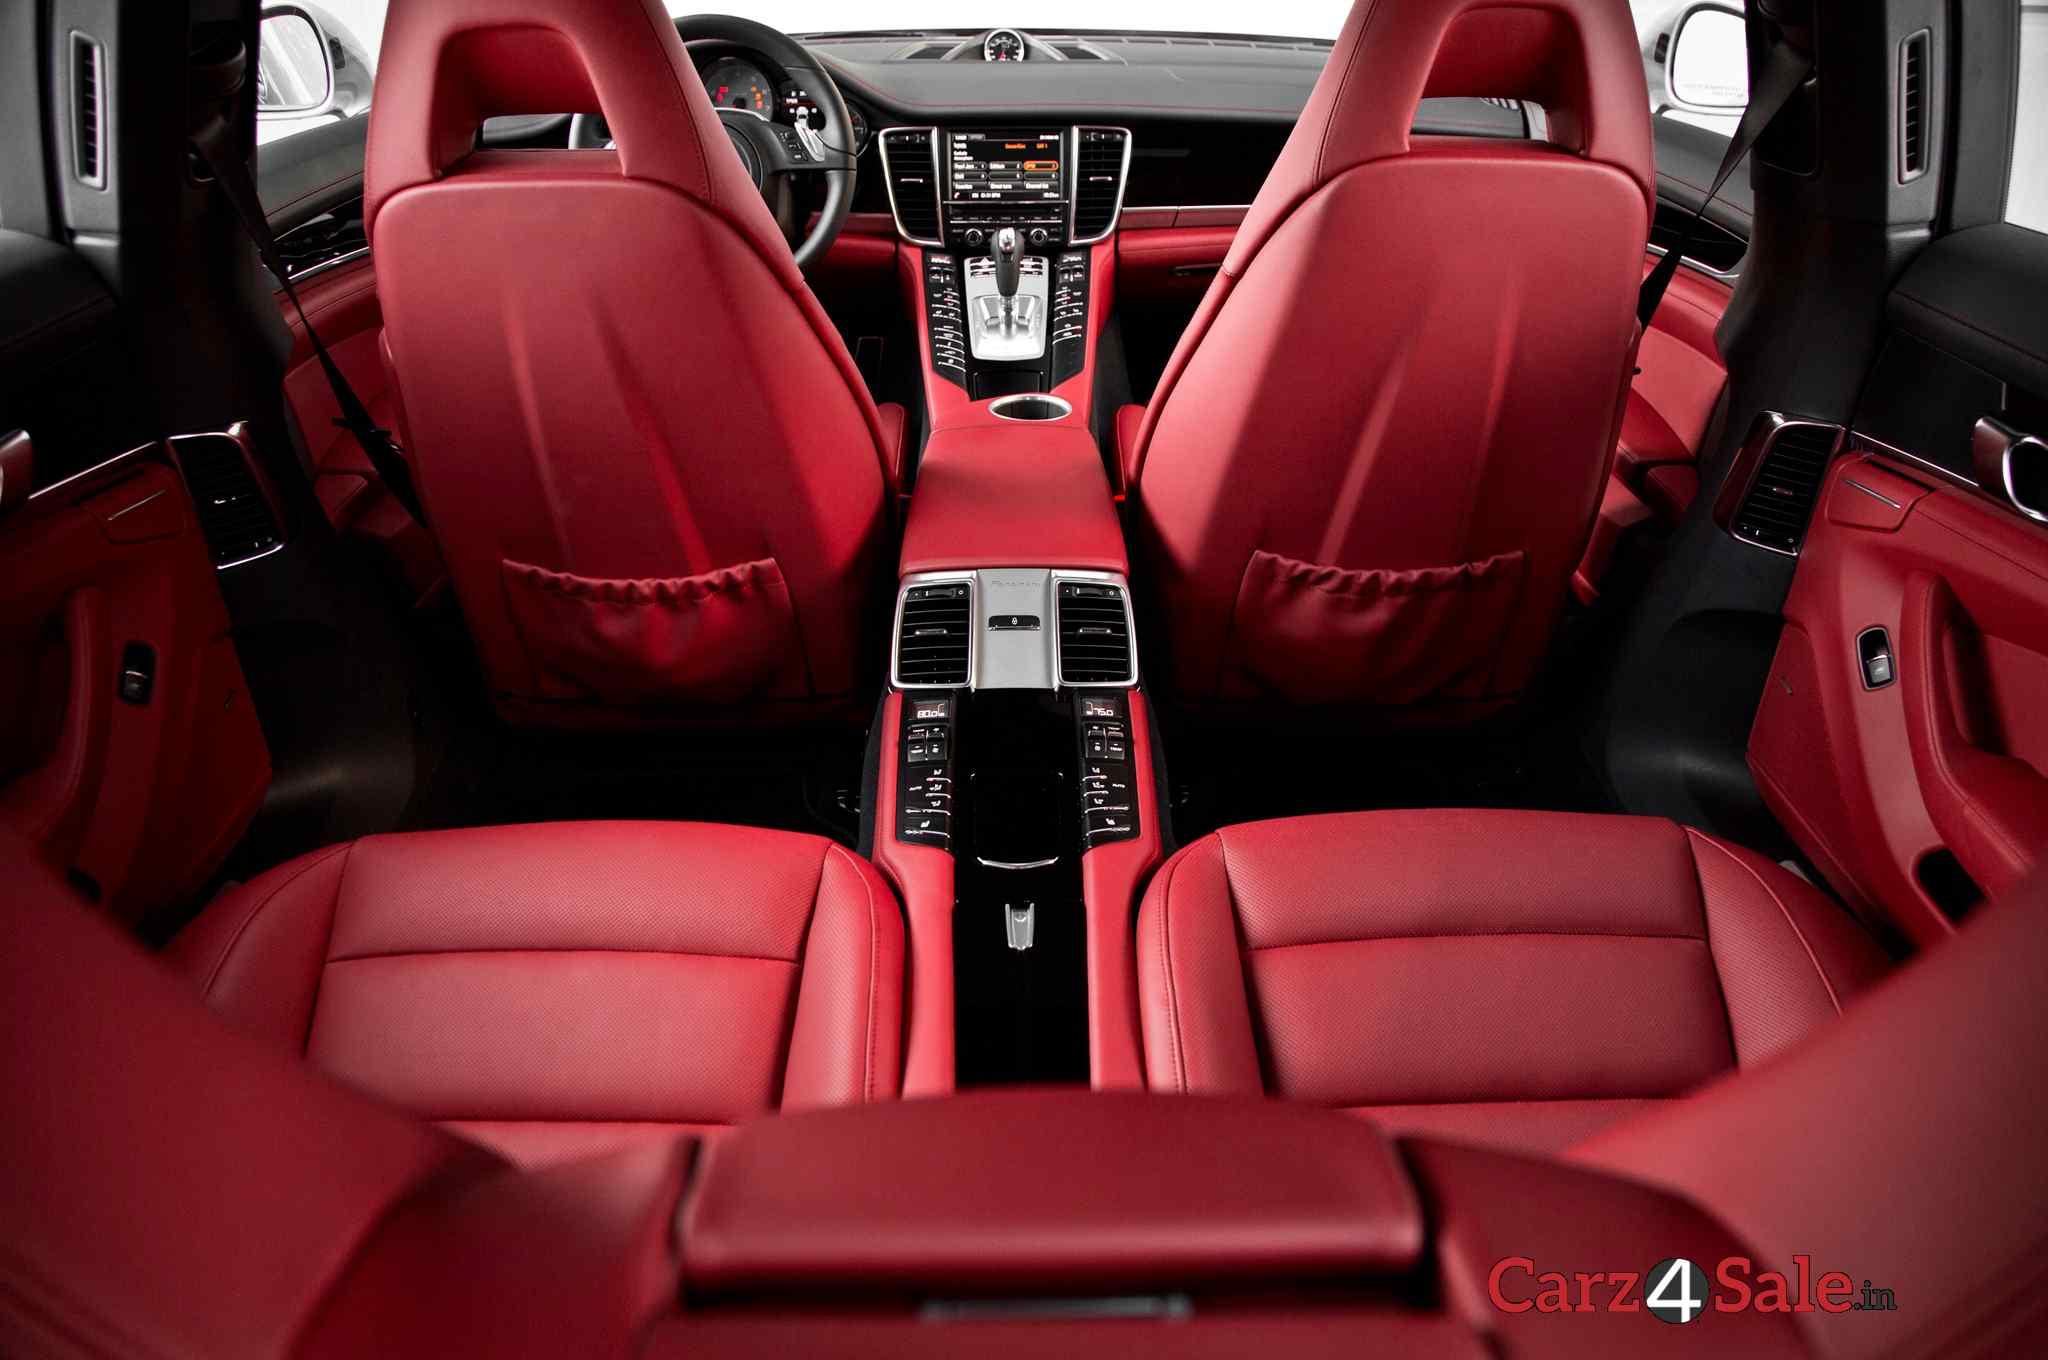 2015 porsche panamera interior - 2015 Porsche Panamera Interior